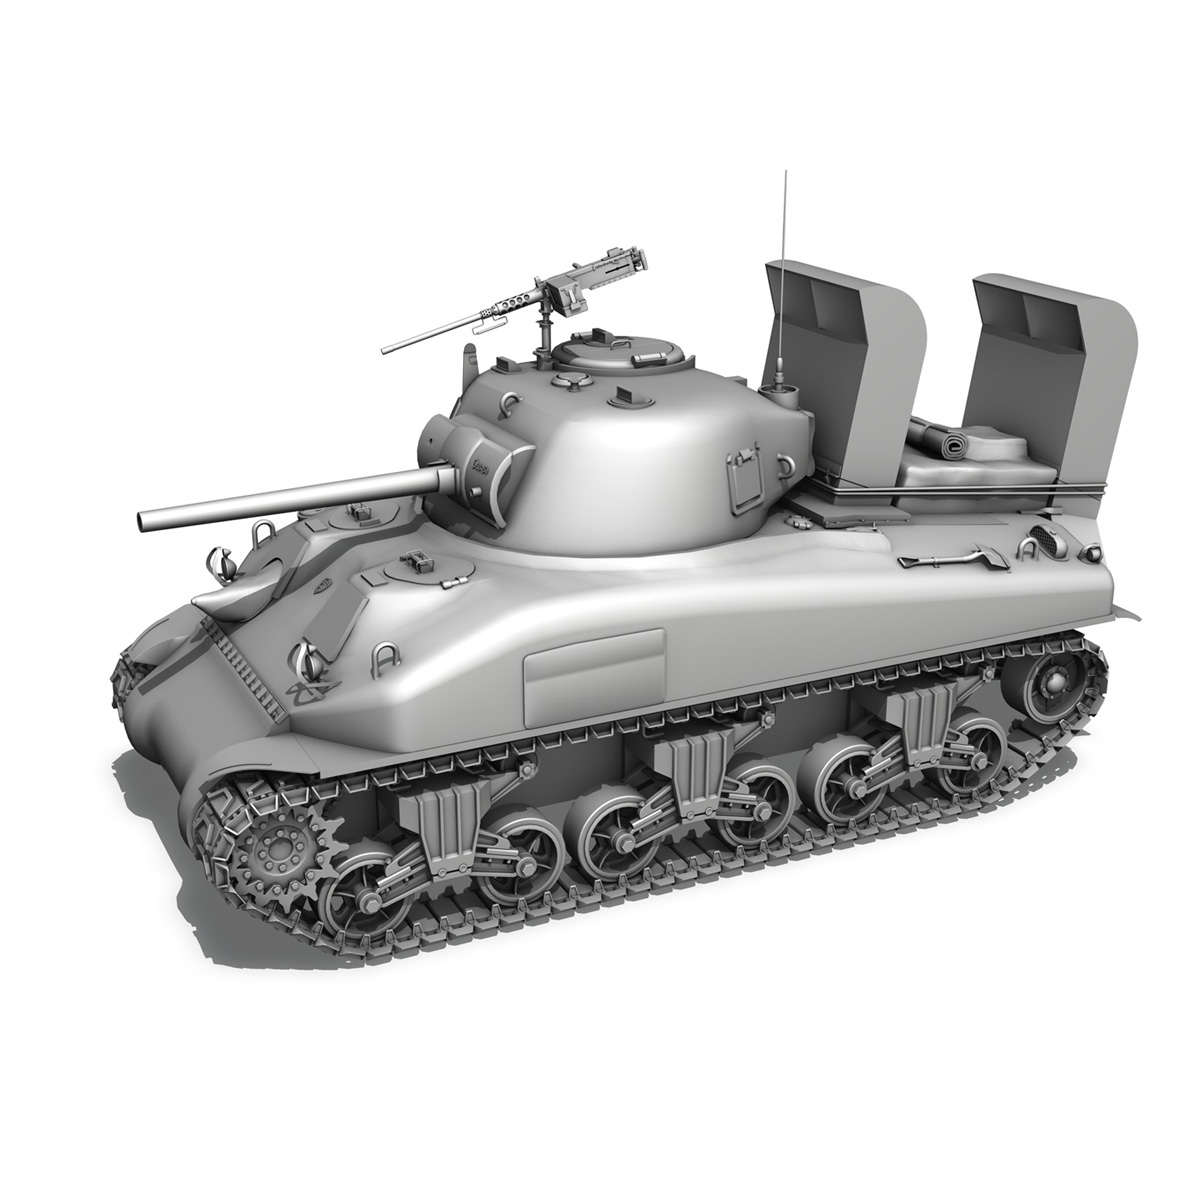 M4A1 Sherman - 16 3d model 3ds fbx c4d lwo lws lw obj 273060